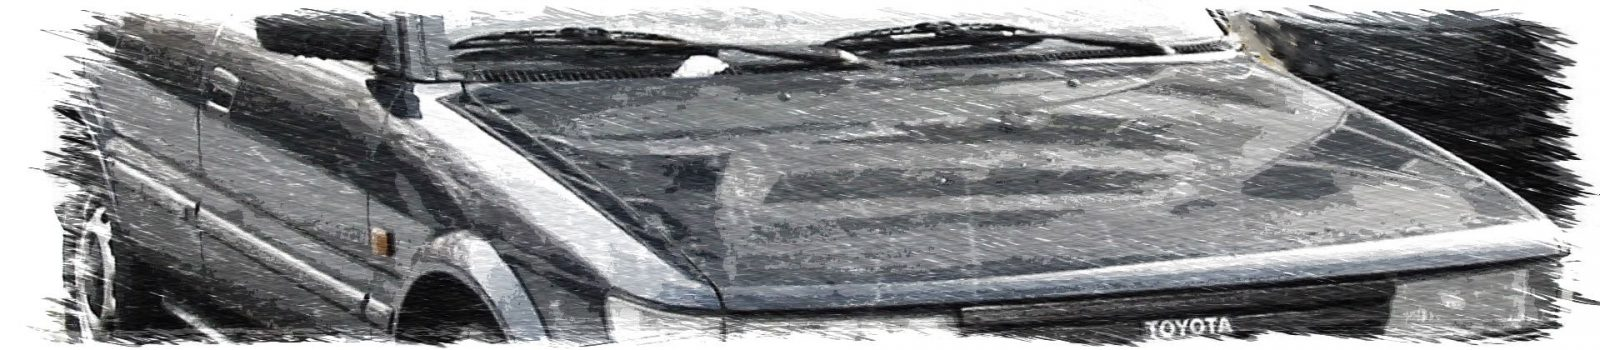 Toyota-Corolla-1920x420-FX